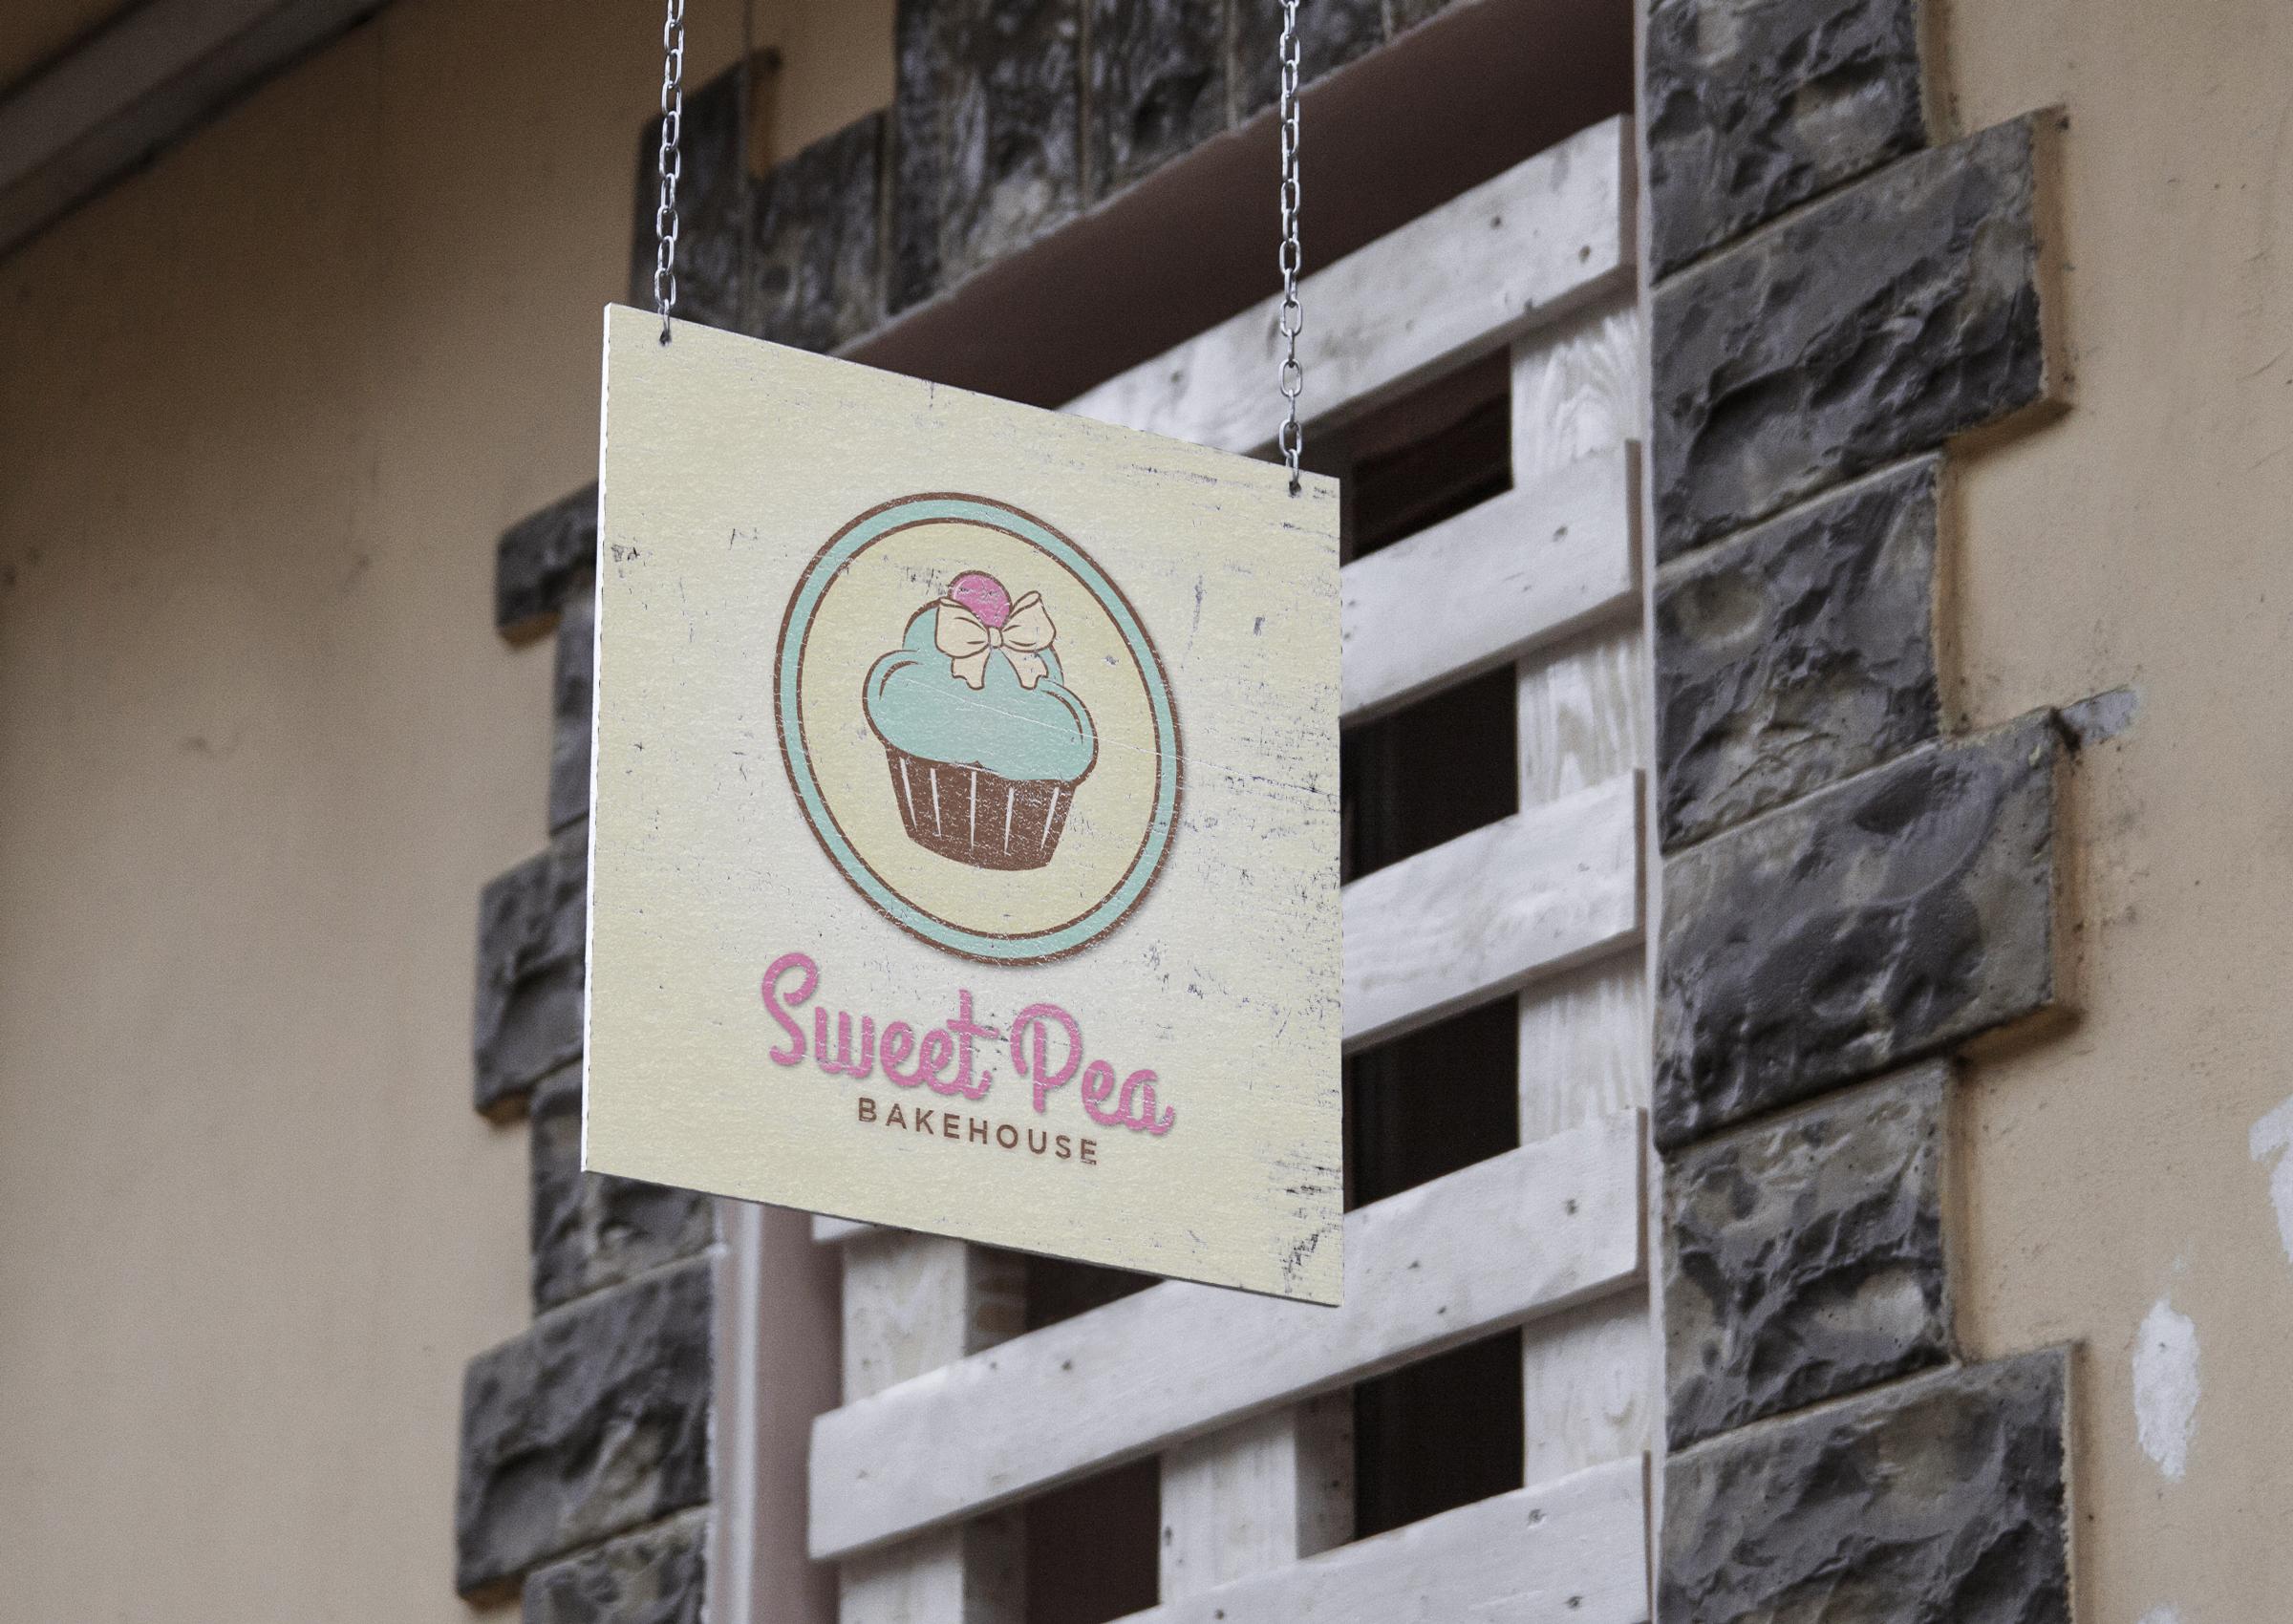 Sweet-Pea-Bakehouse-sign.jpg